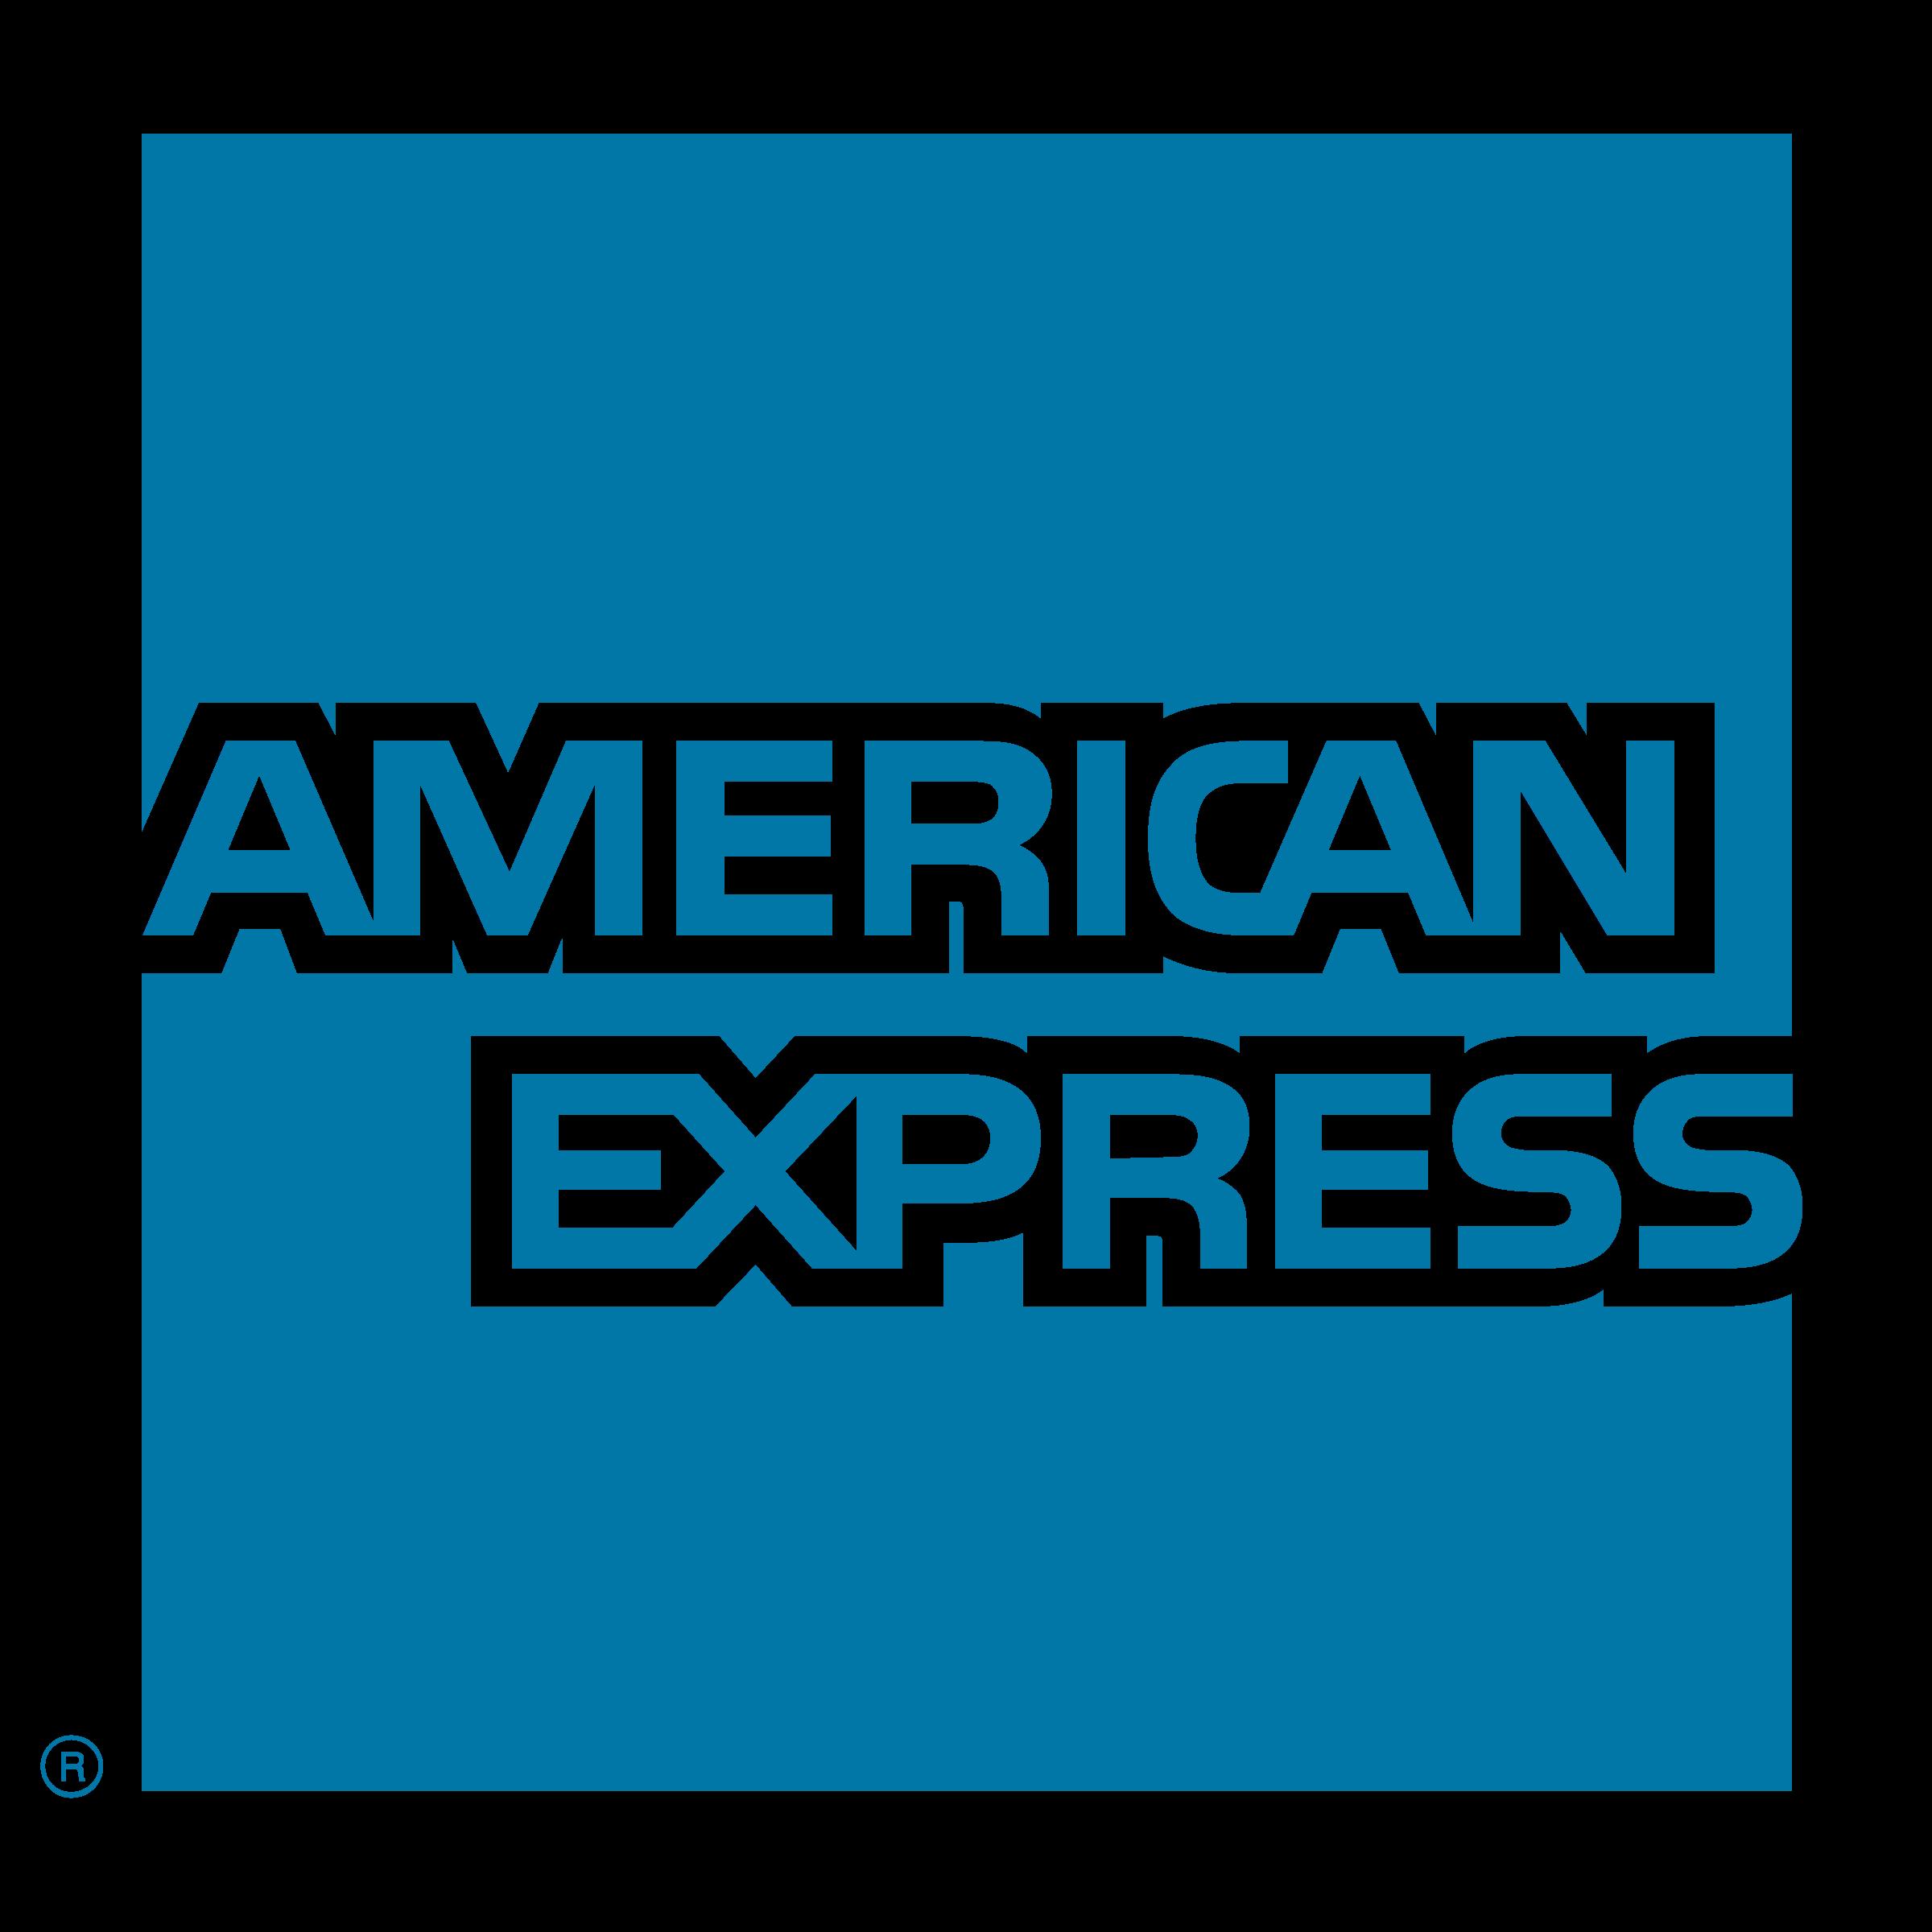 American Express 630 Logo PNG Transparent & SVG Vector.